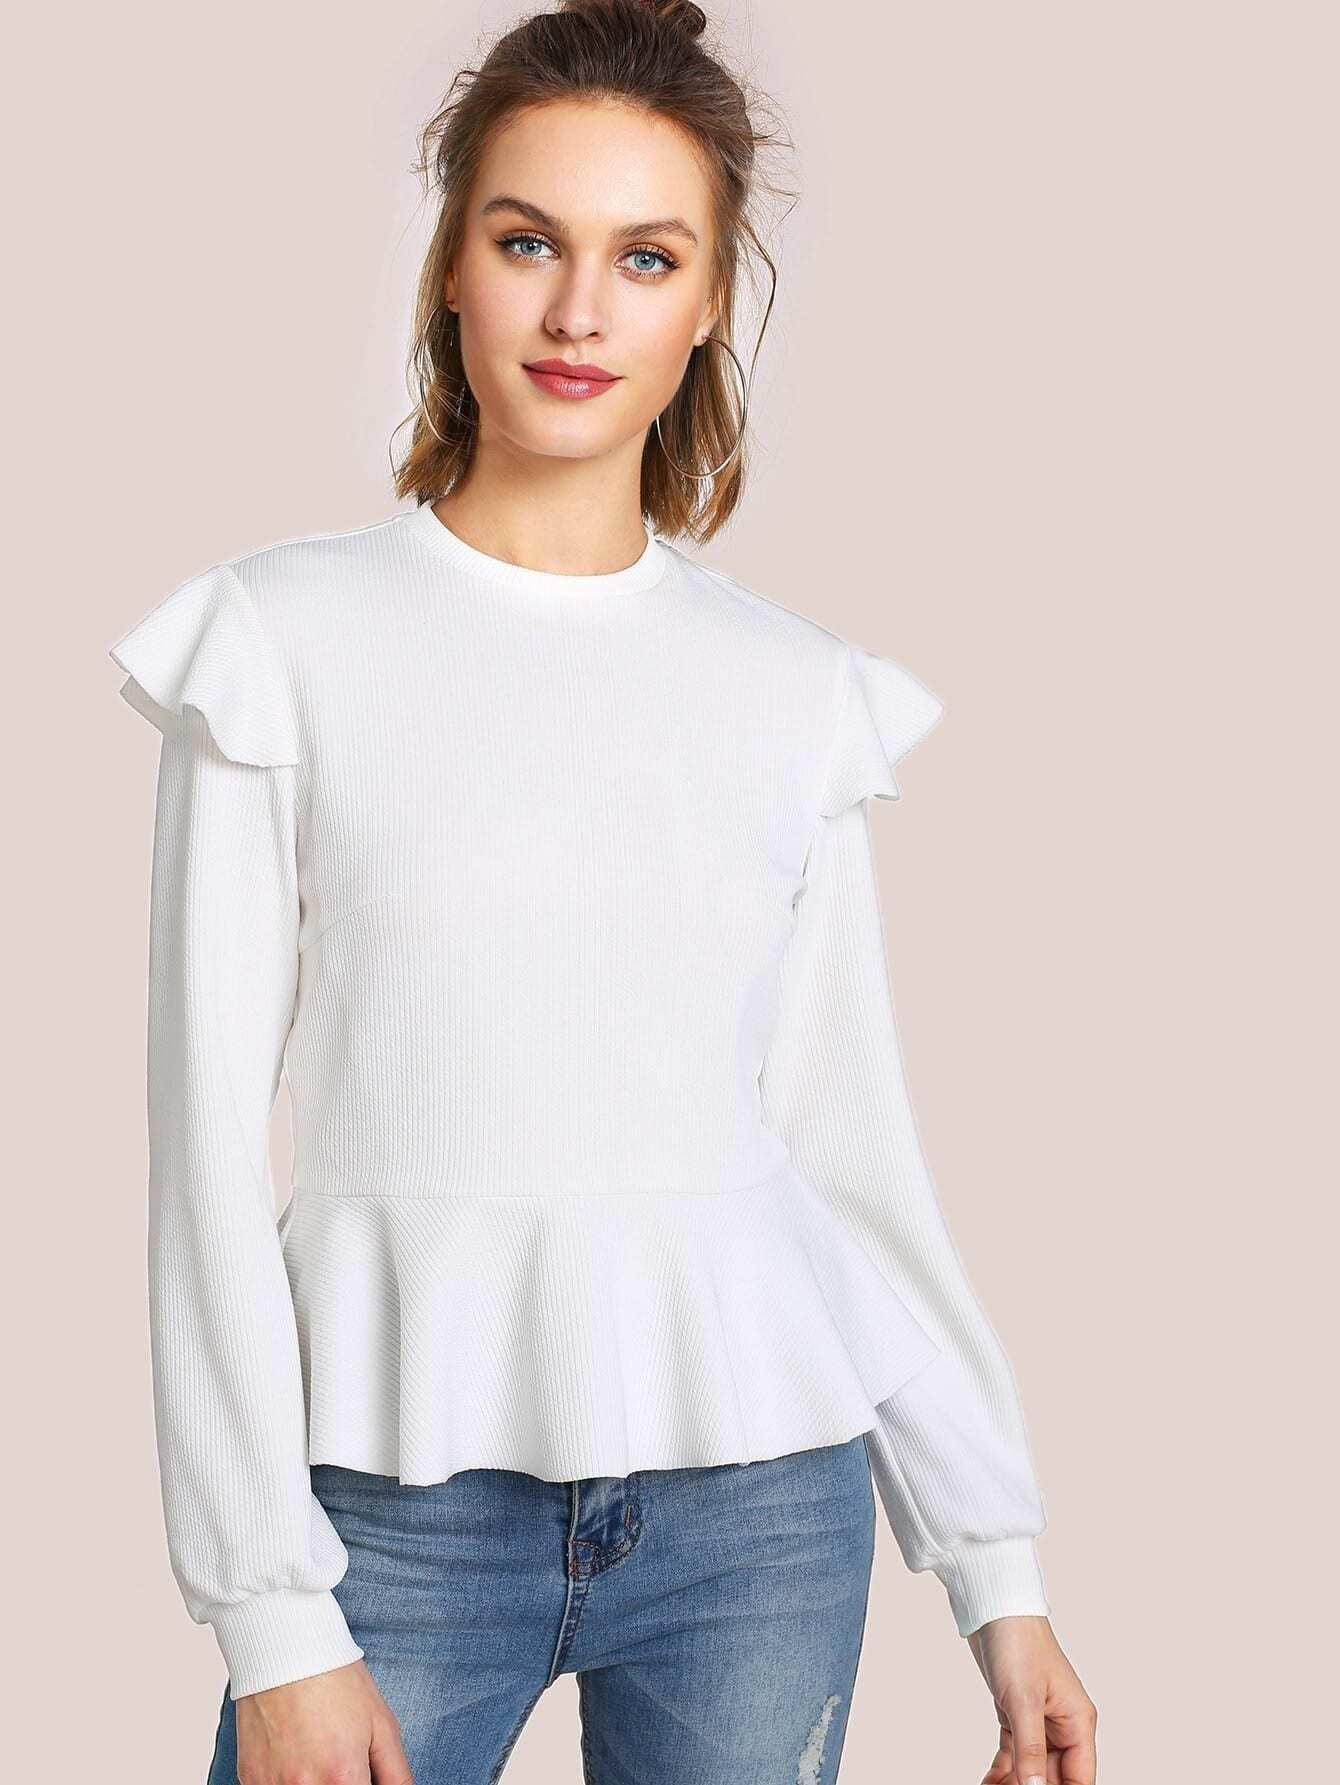 Ruffle Shoulder Rib Knit Peplum Top blouse171213705